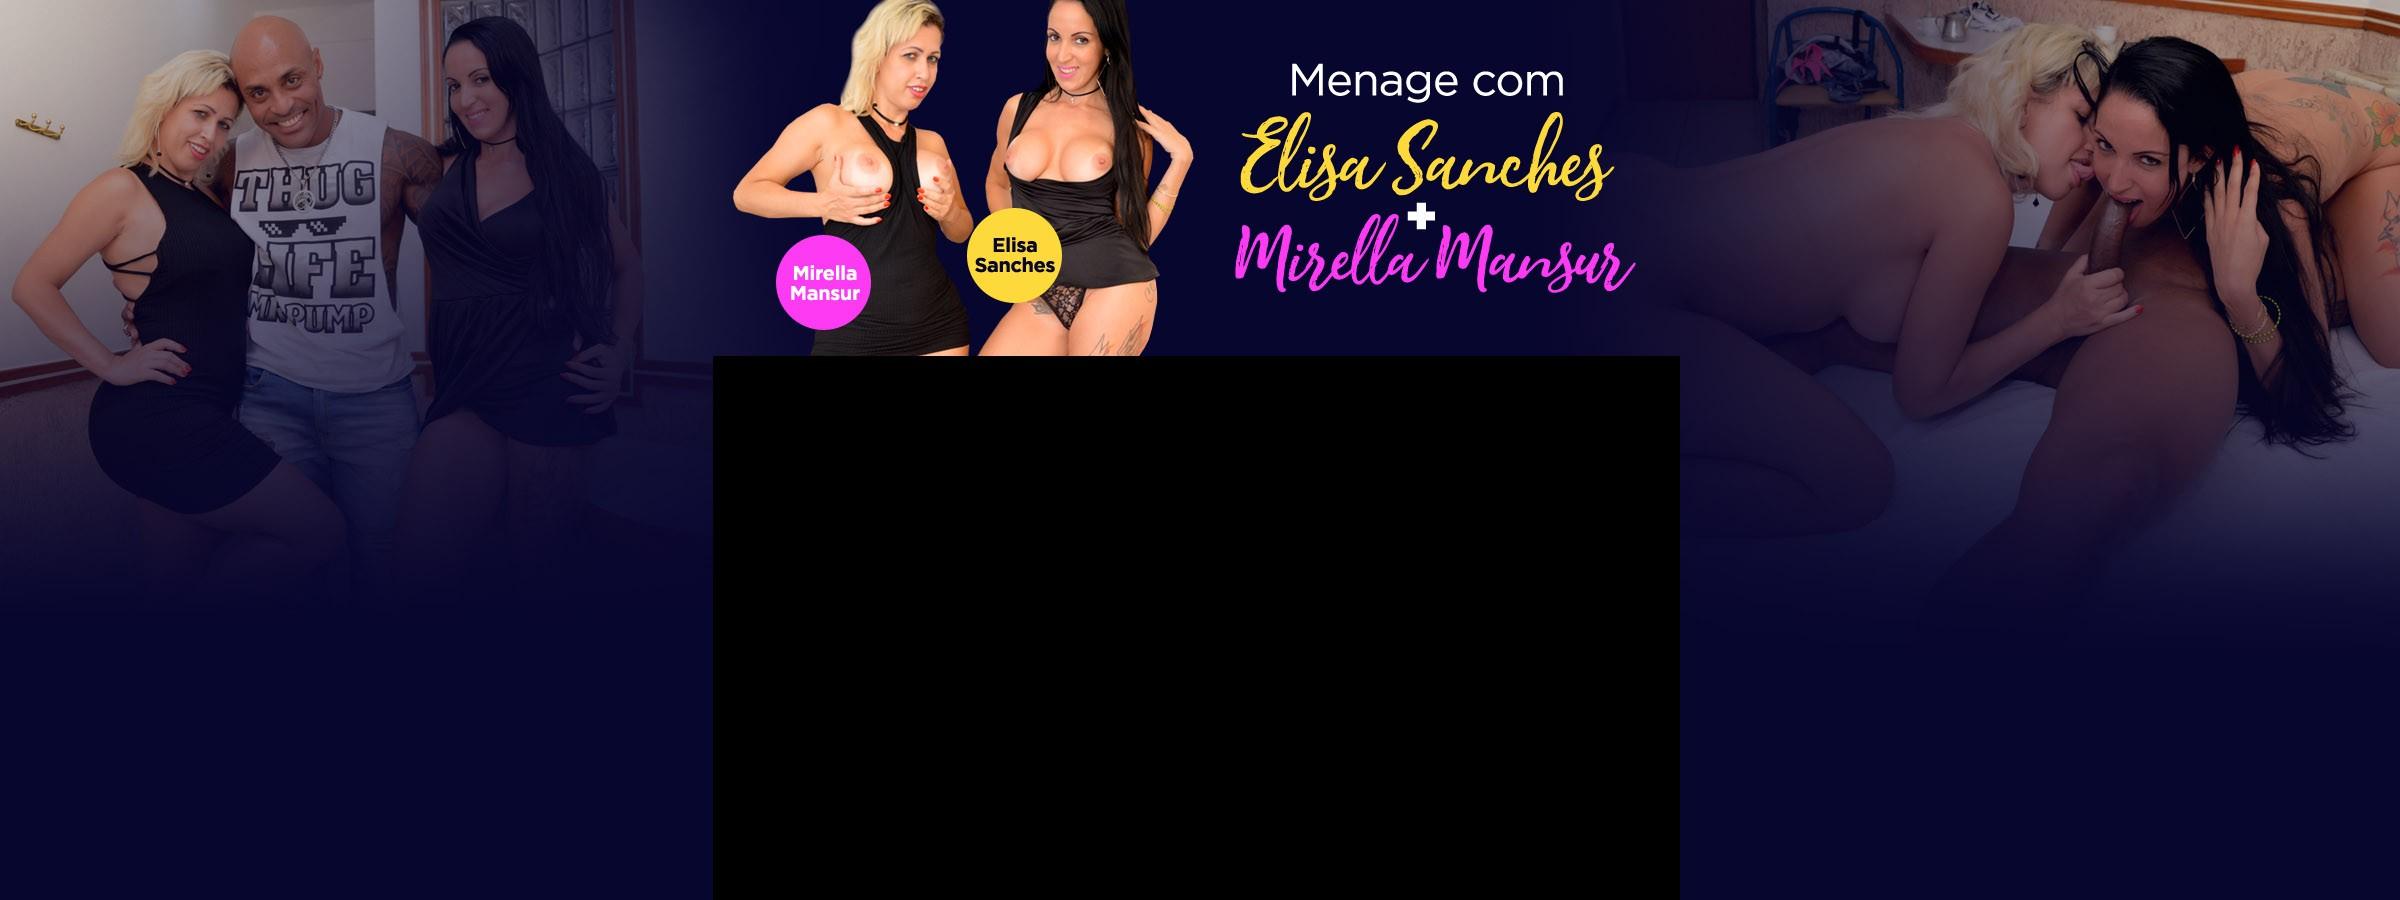 Menage com Elisa Sanches e Mirella Mansur